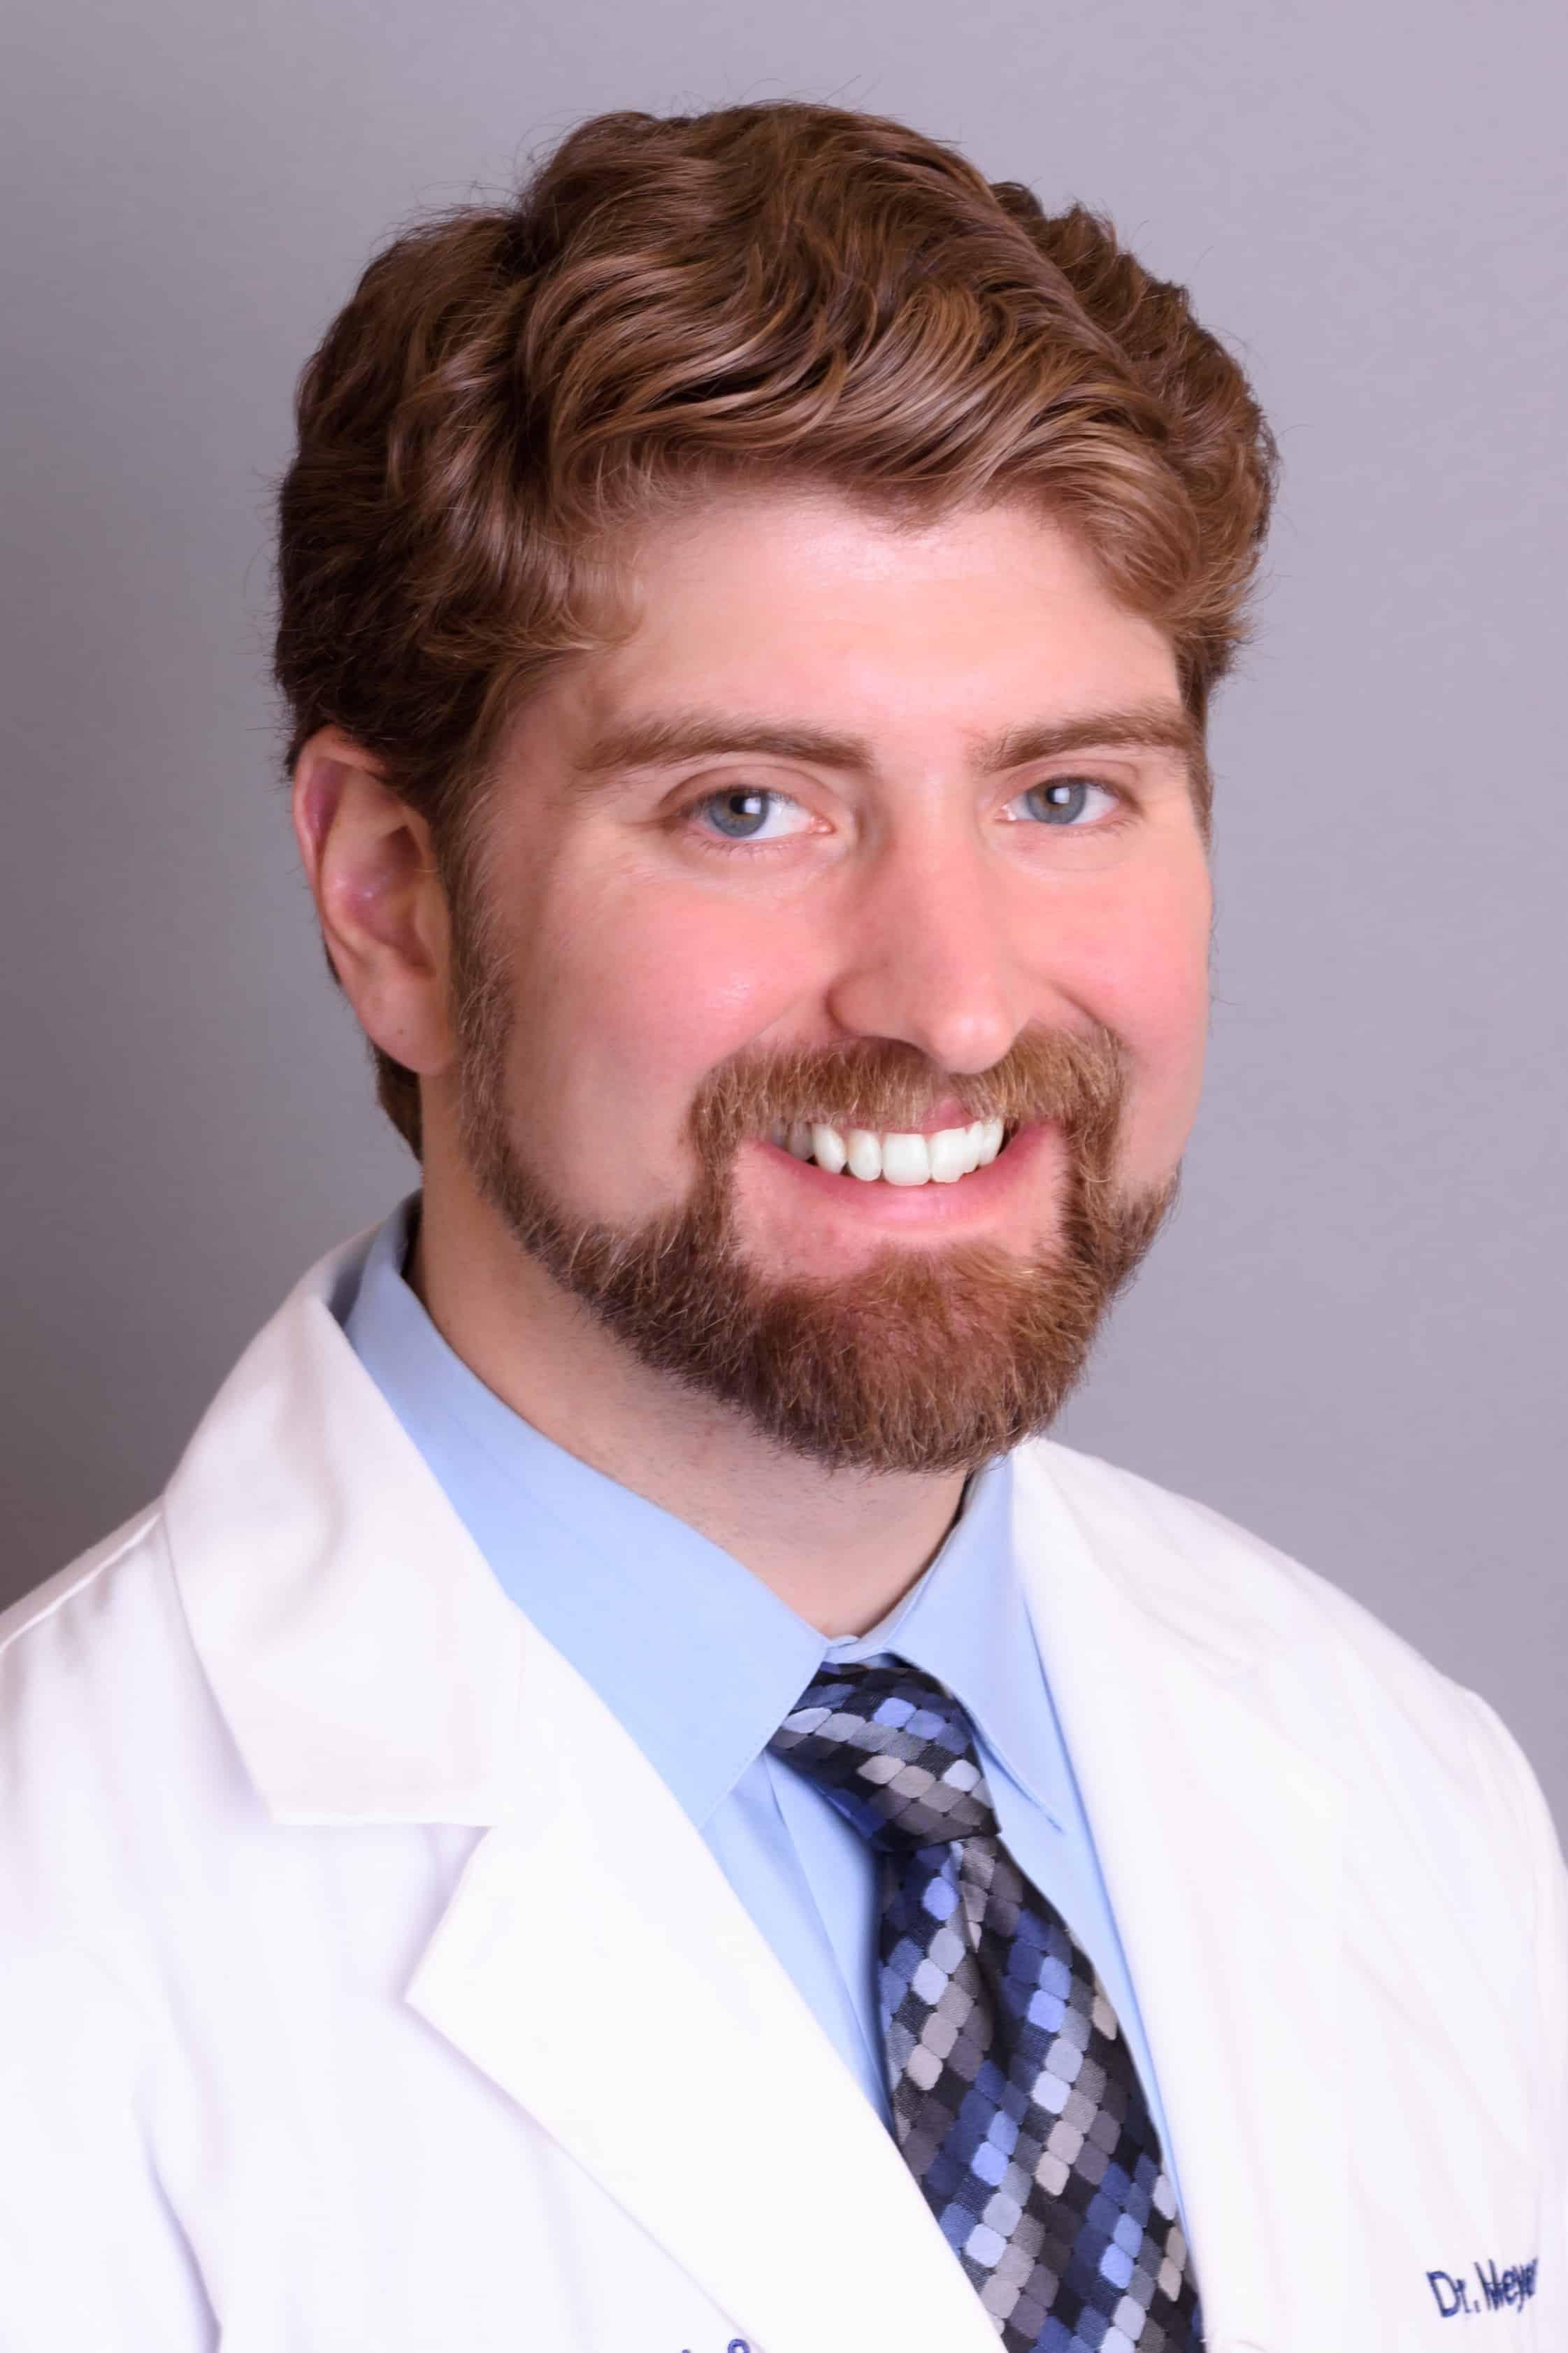 Dr. Jordan Meyers